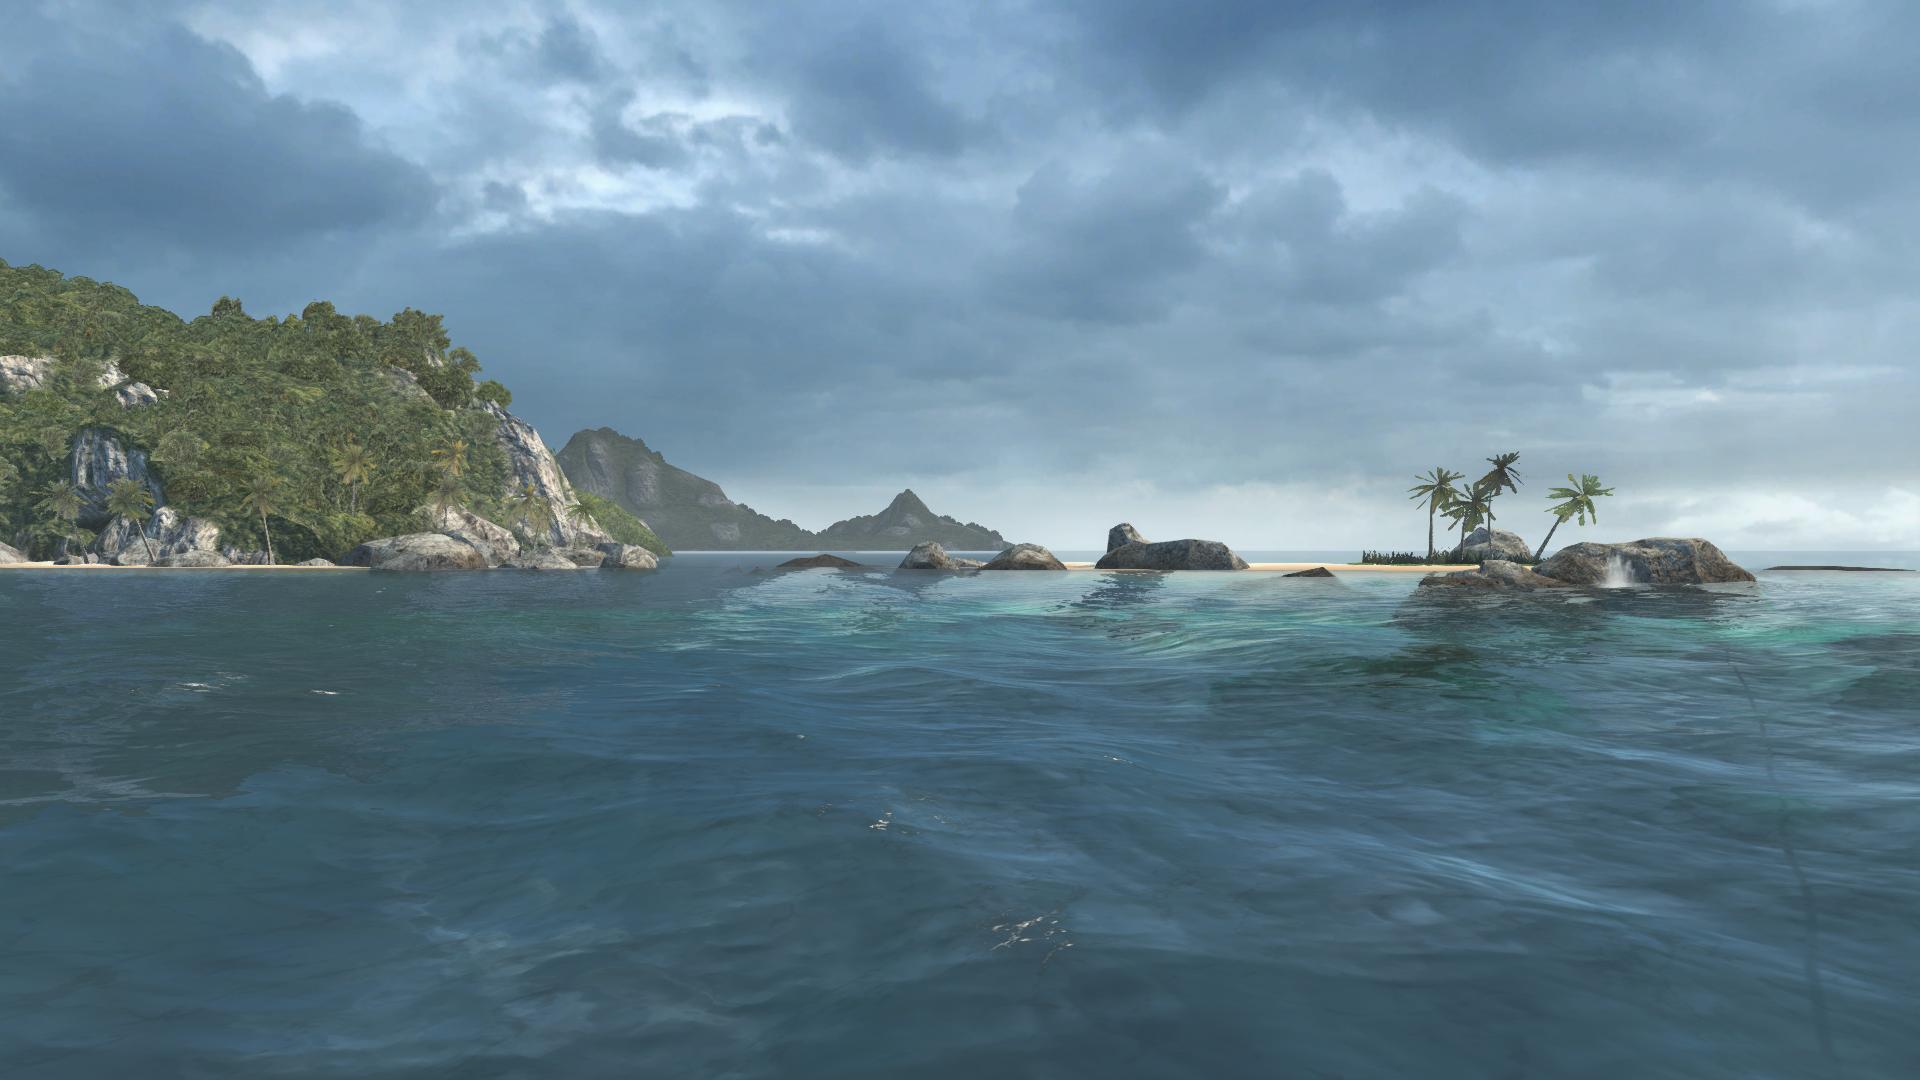 Caribbean Sea Assassin S Creed Wiki